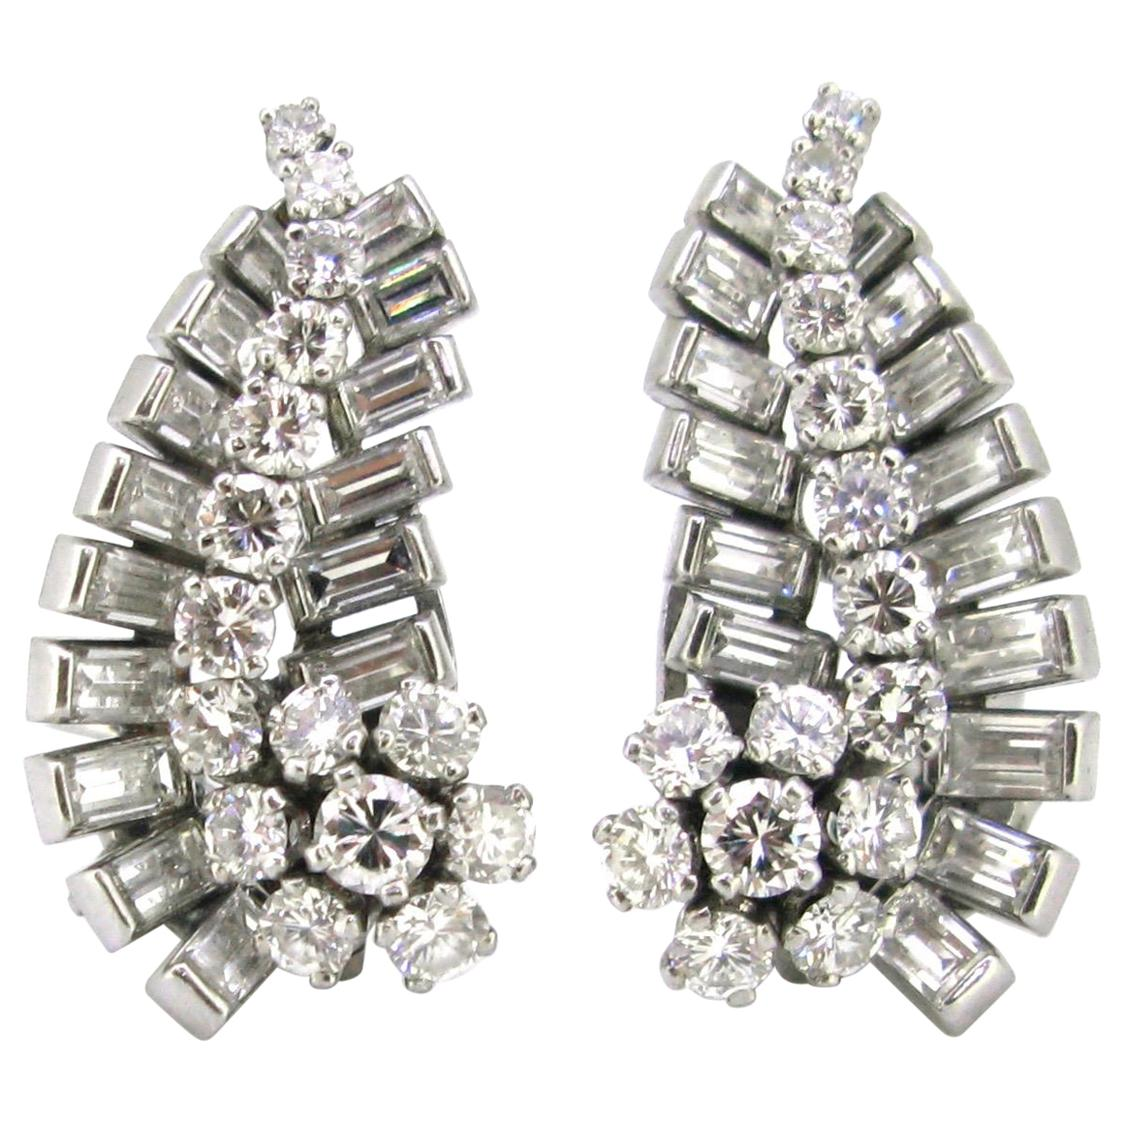 Art Deco 6 Carat Diamonds Earrings Clips, 18 Karat Gold and Platinum, France